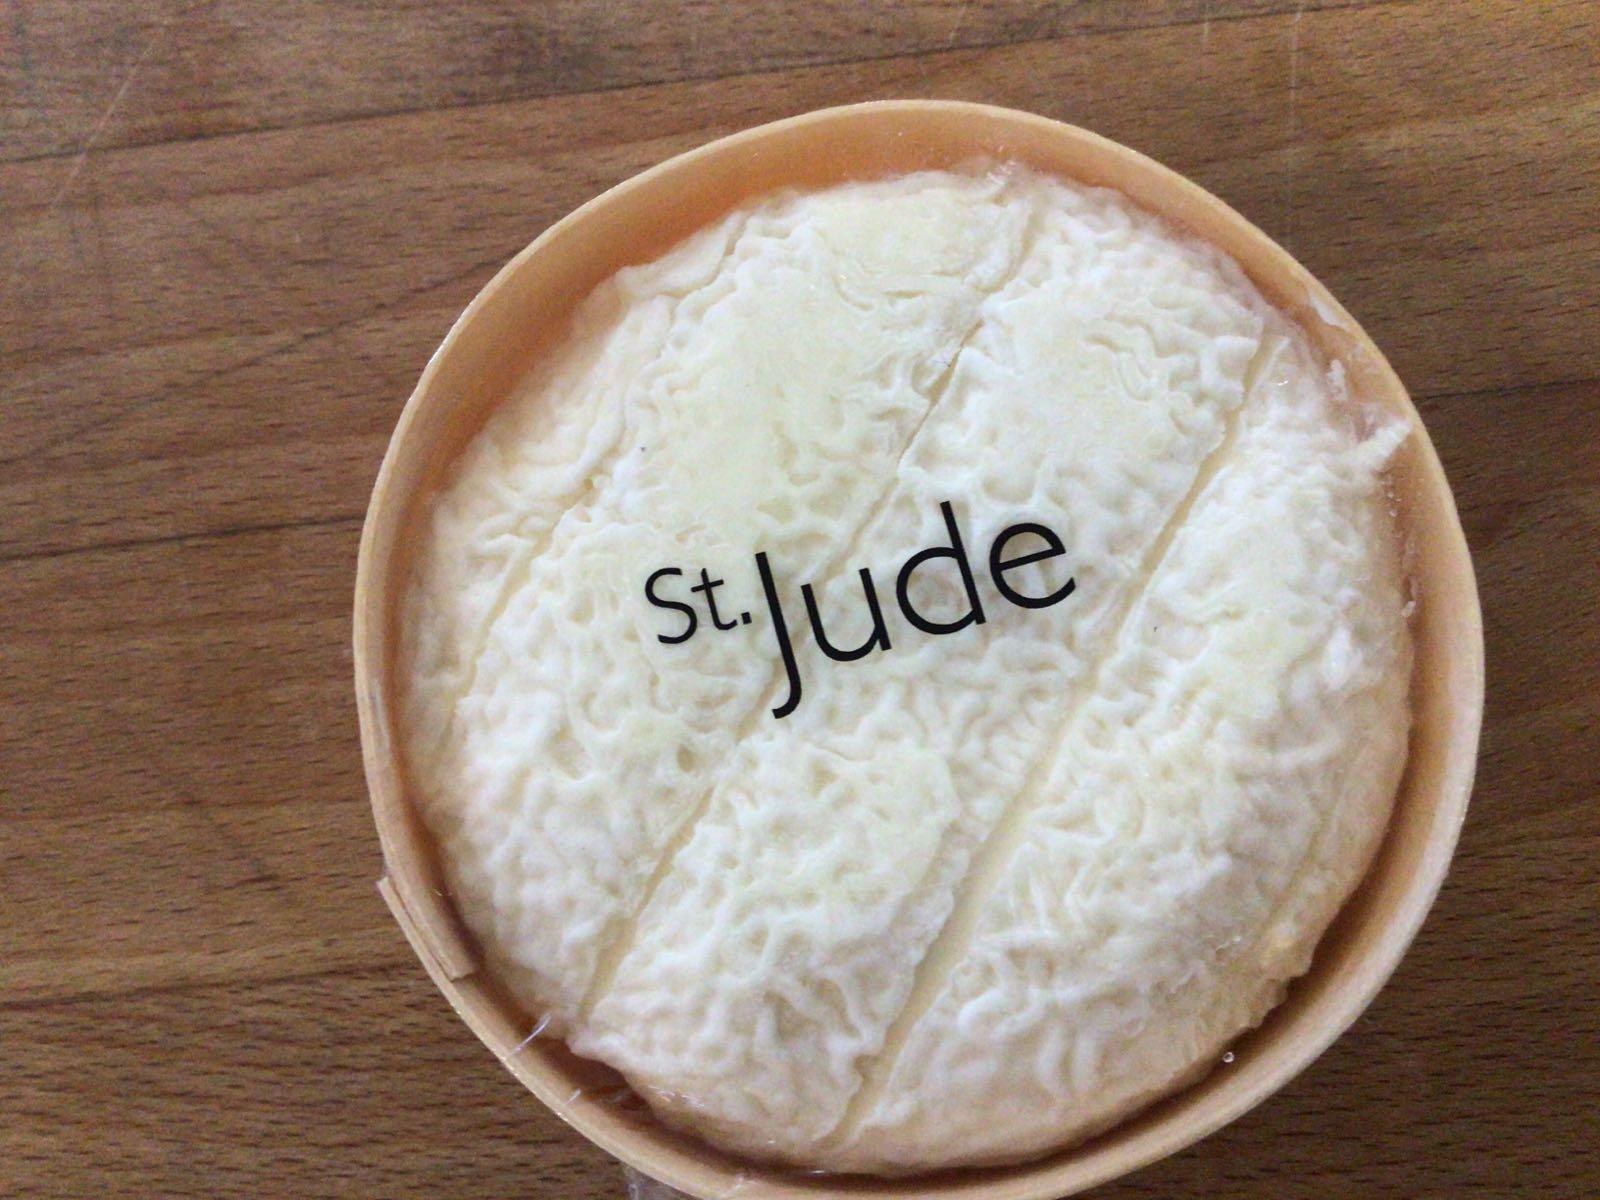 St Jude